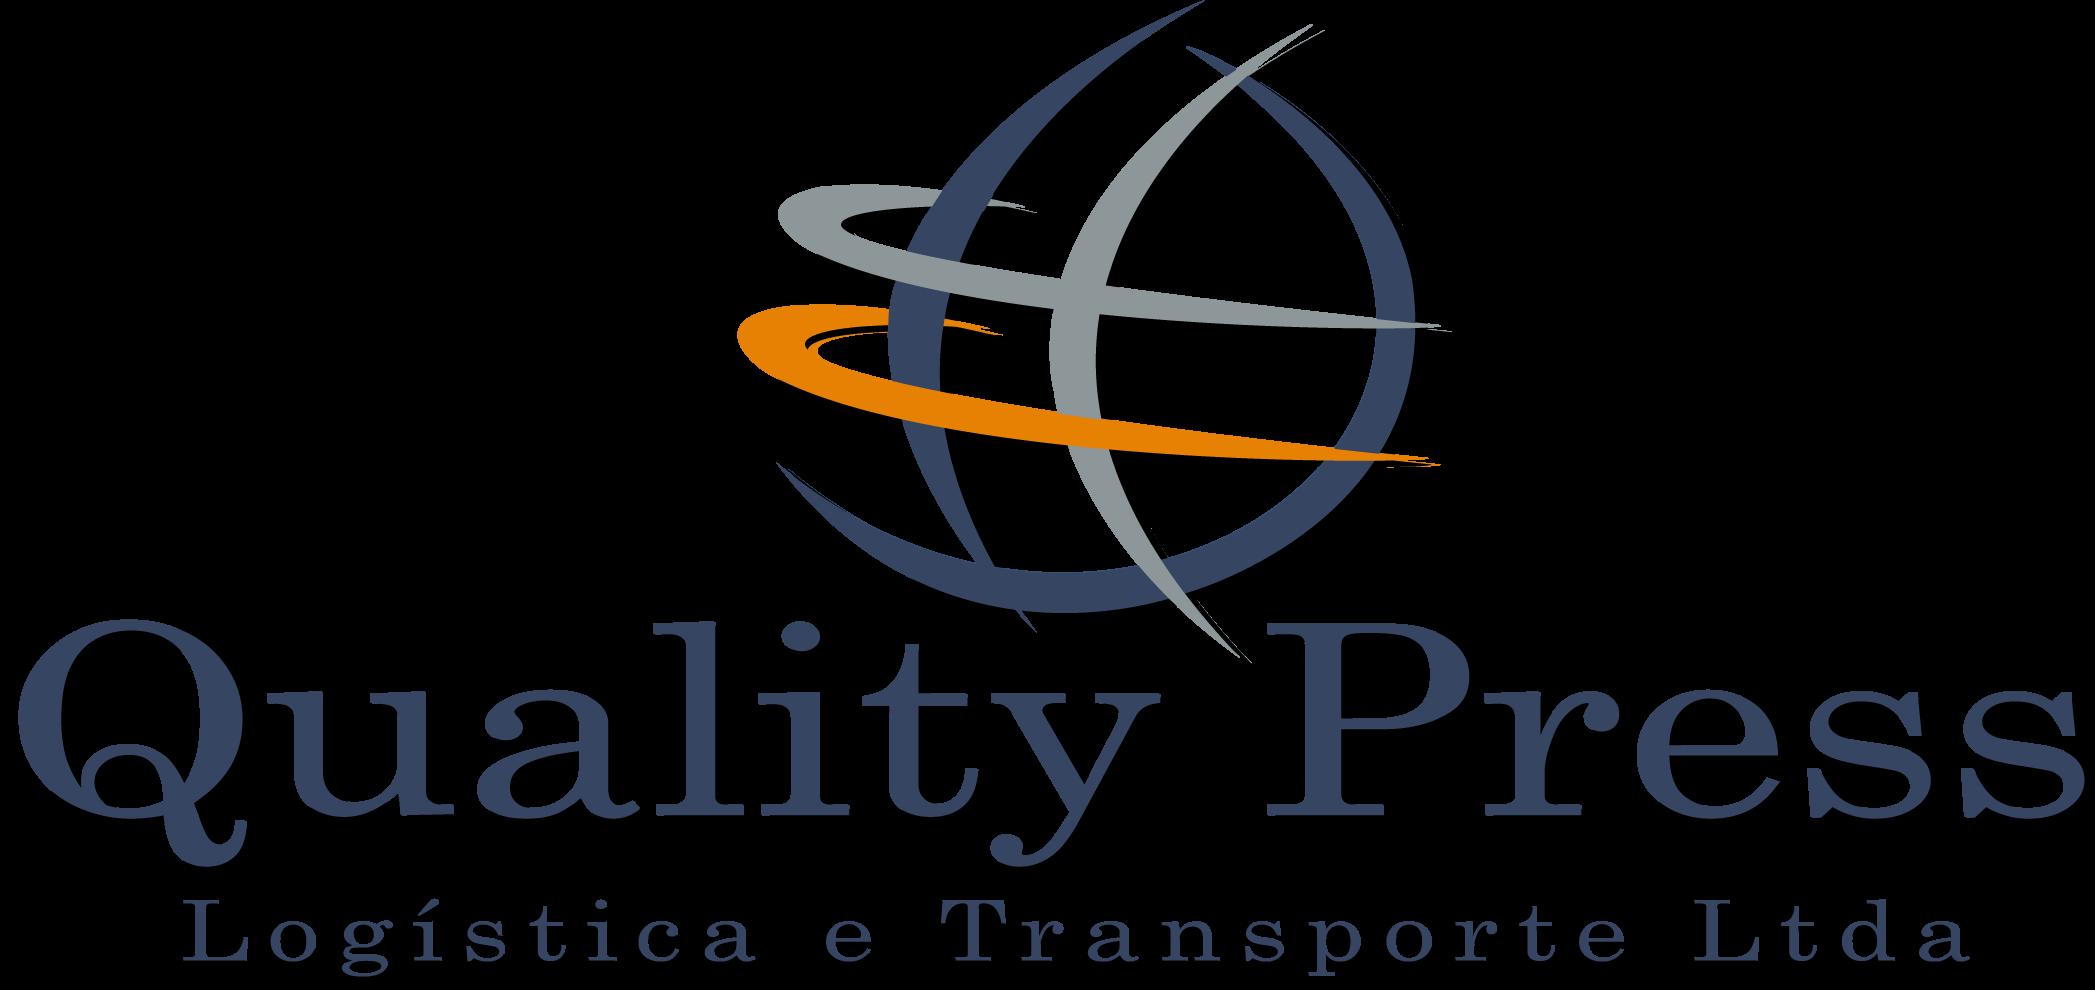 Quality Press